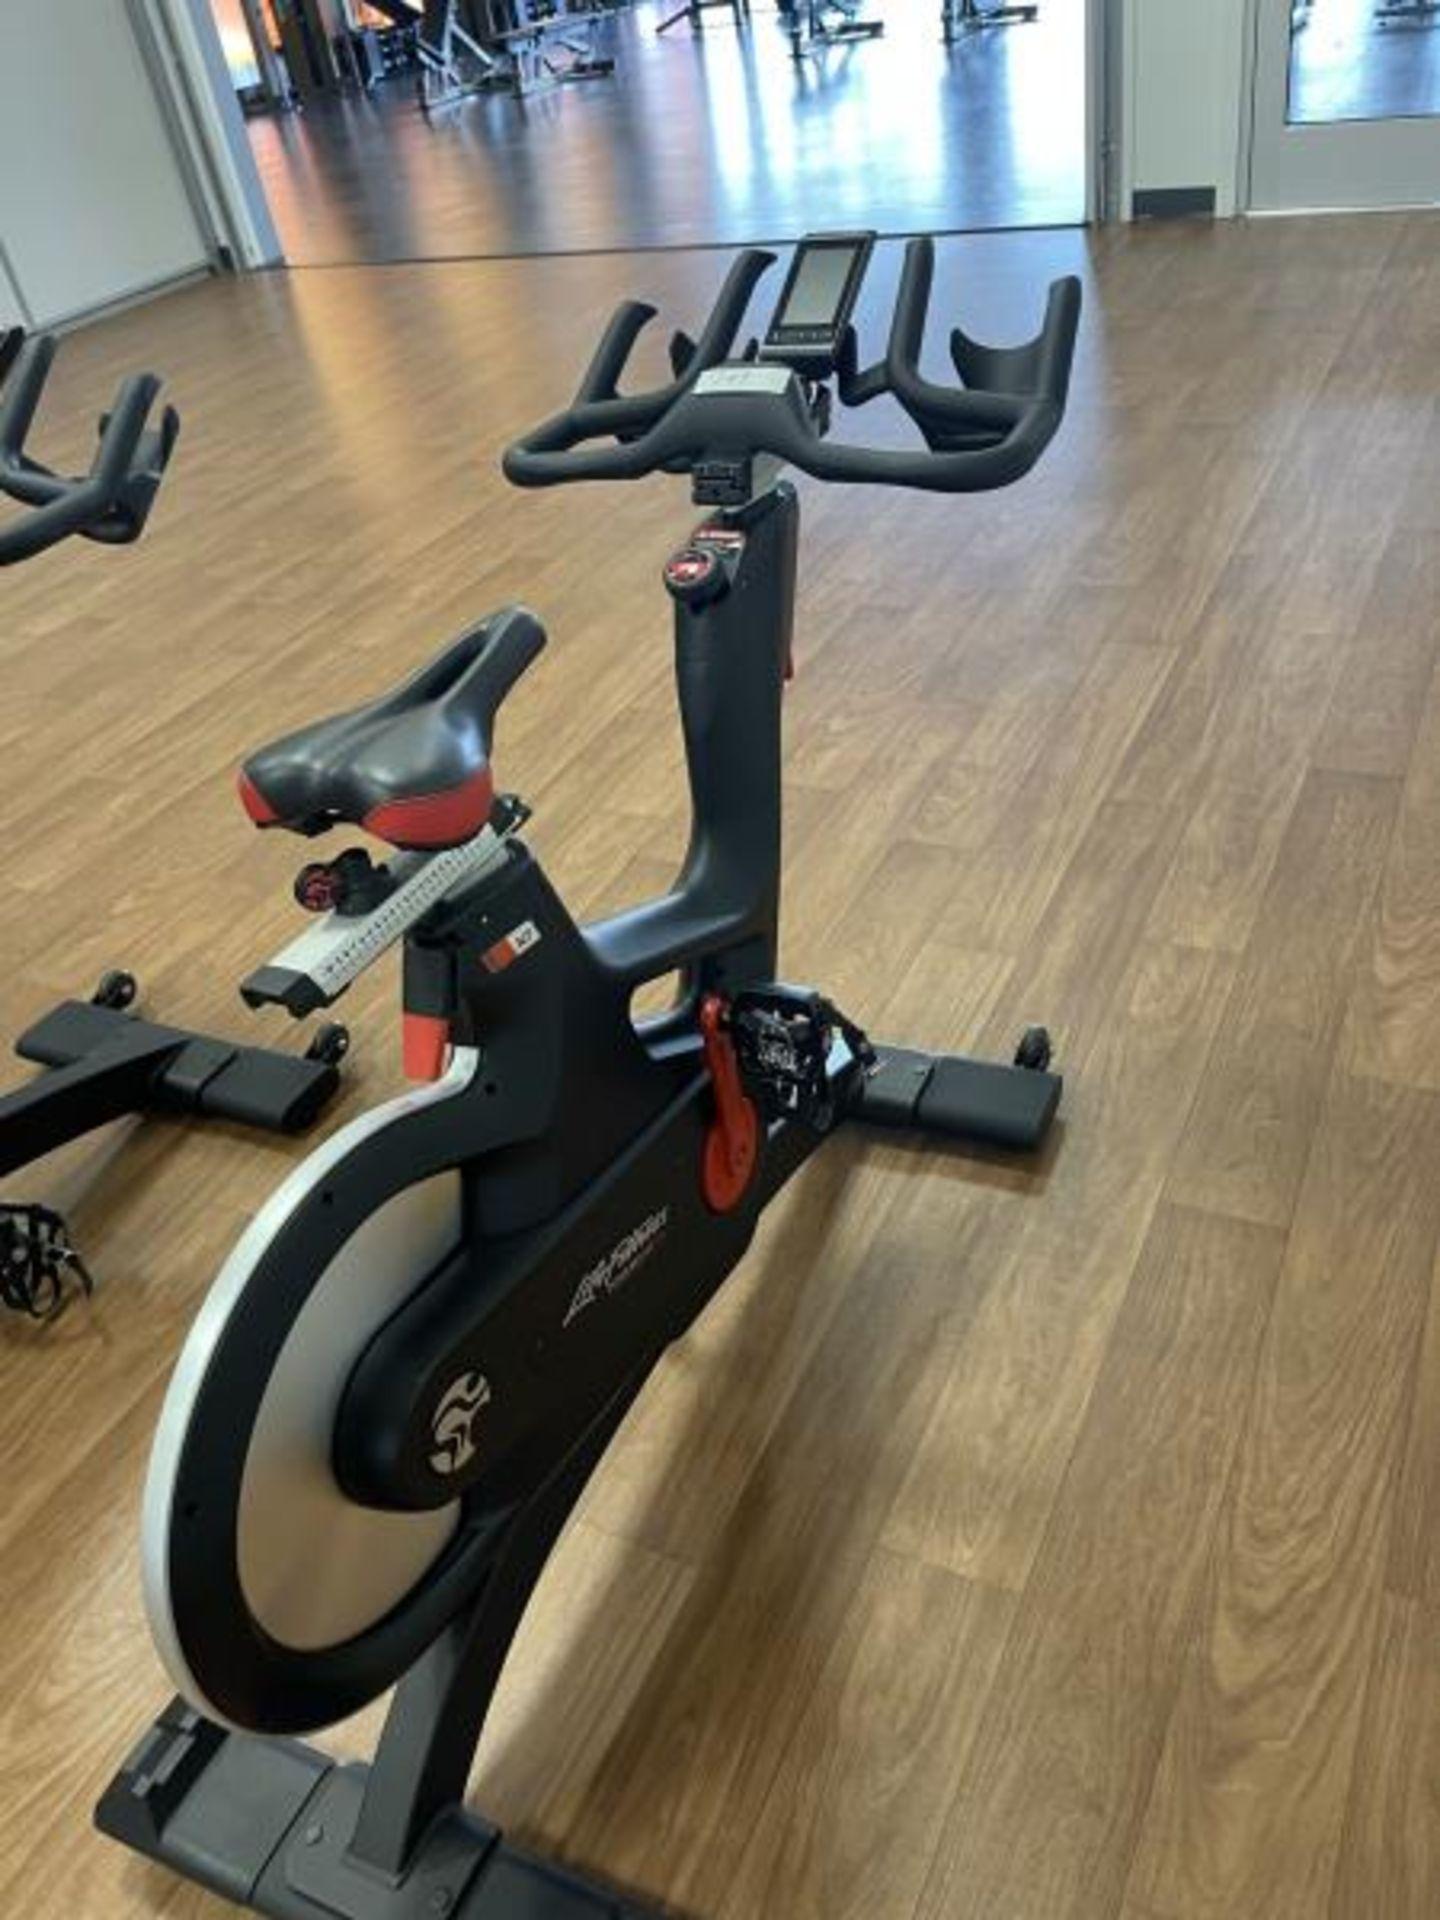 2018 Life Fitness IC7 Spin Bike M: IC-LFIC7B2-01 - Image 3 of 4